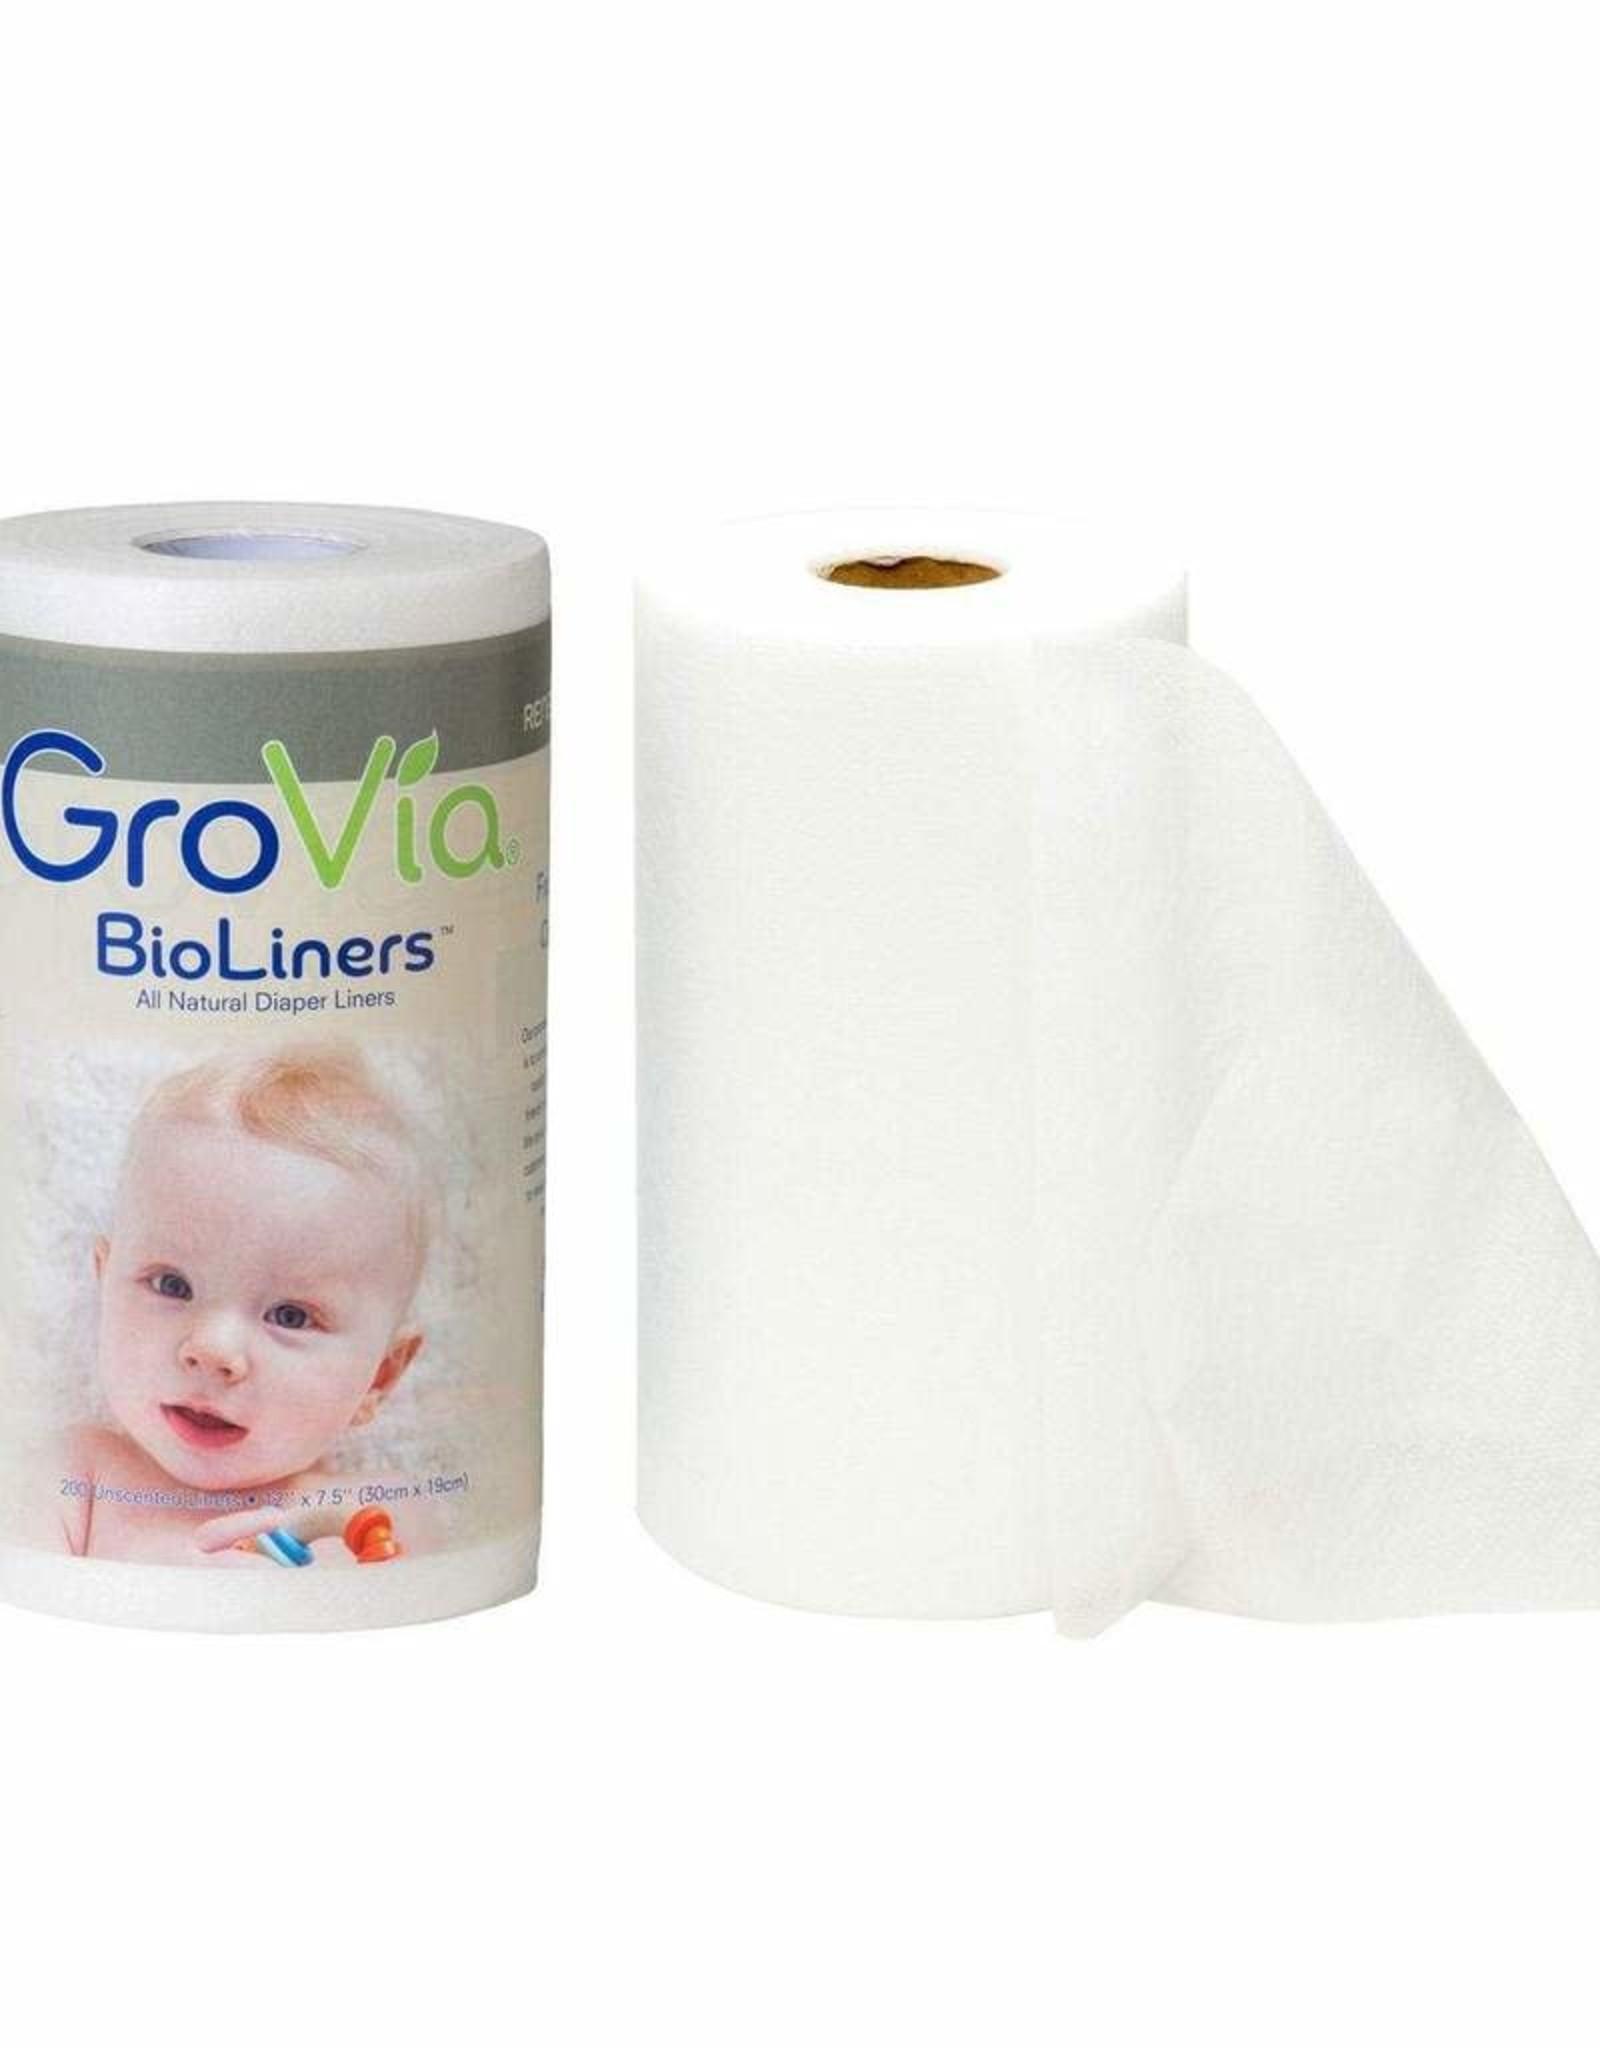 GroVia BioLiners - 200 sheets per roll